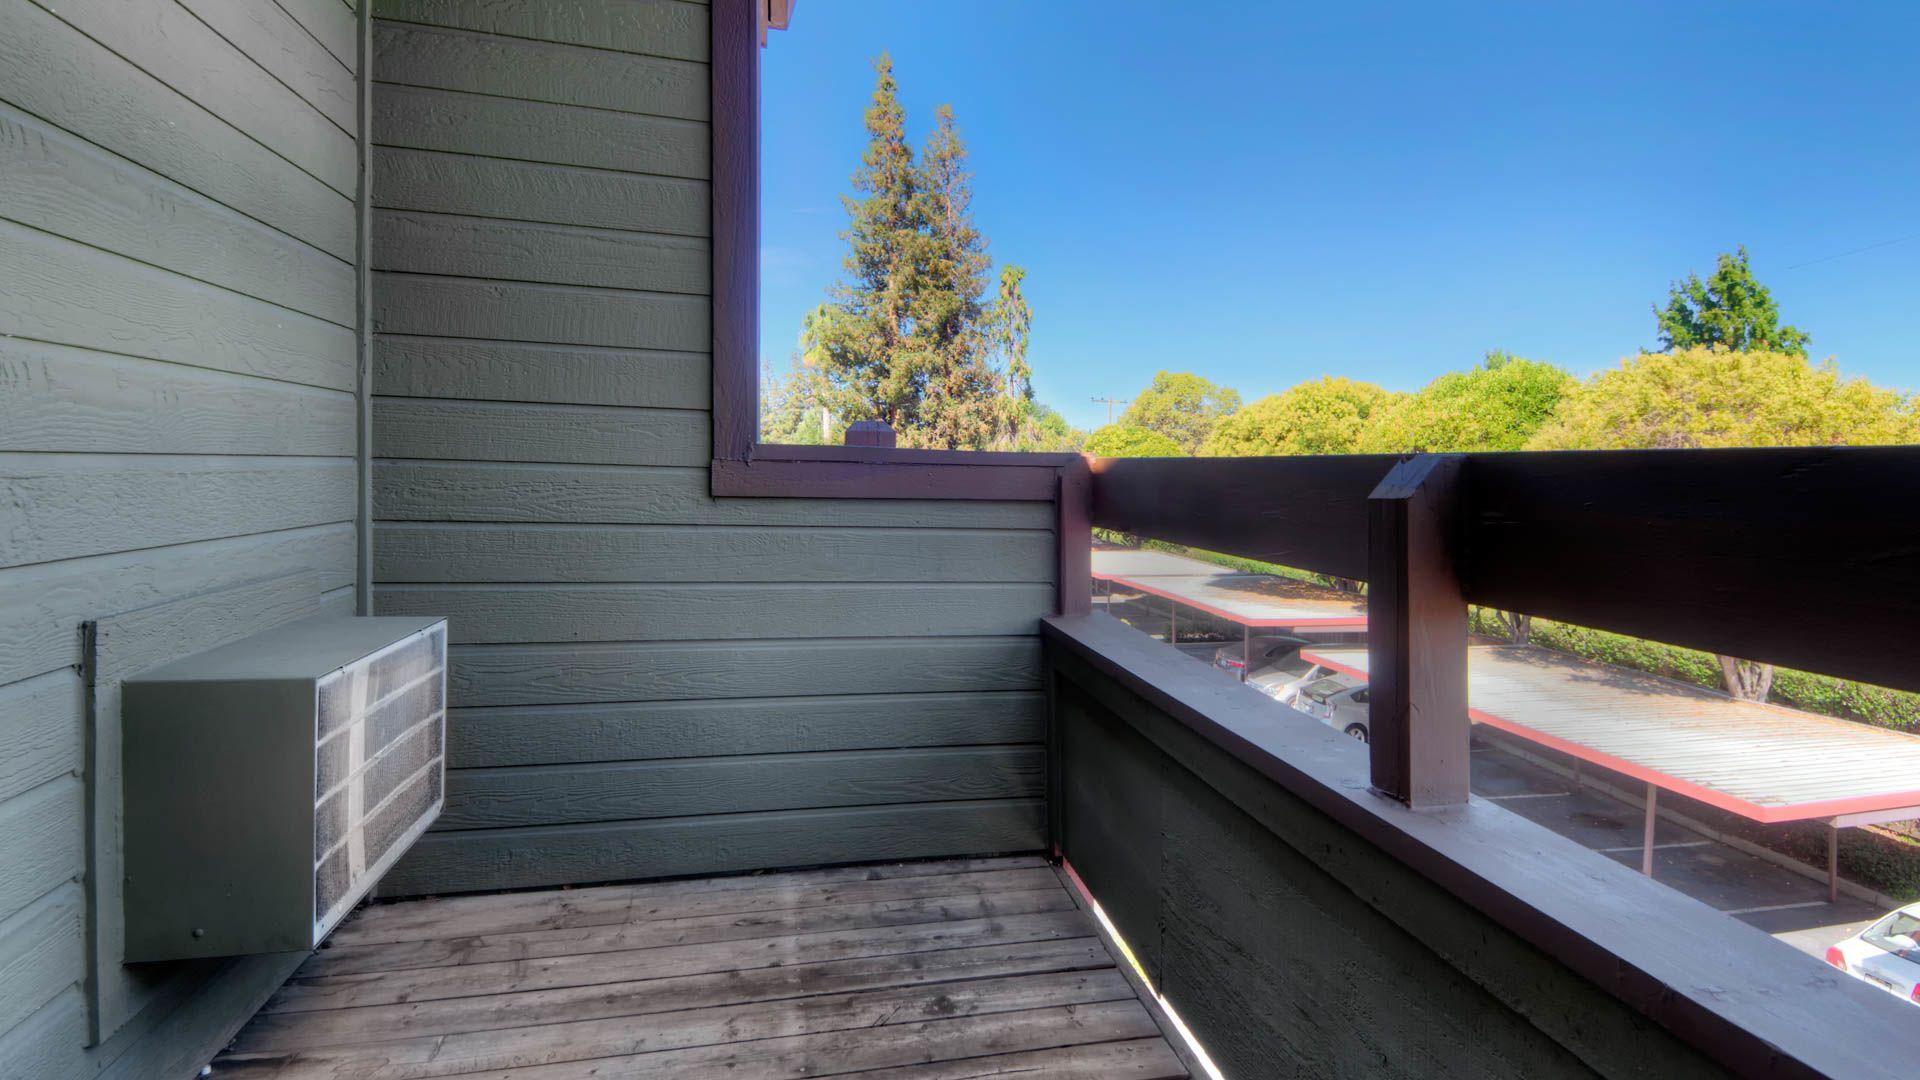 Woodleaf Apartments - Balcony